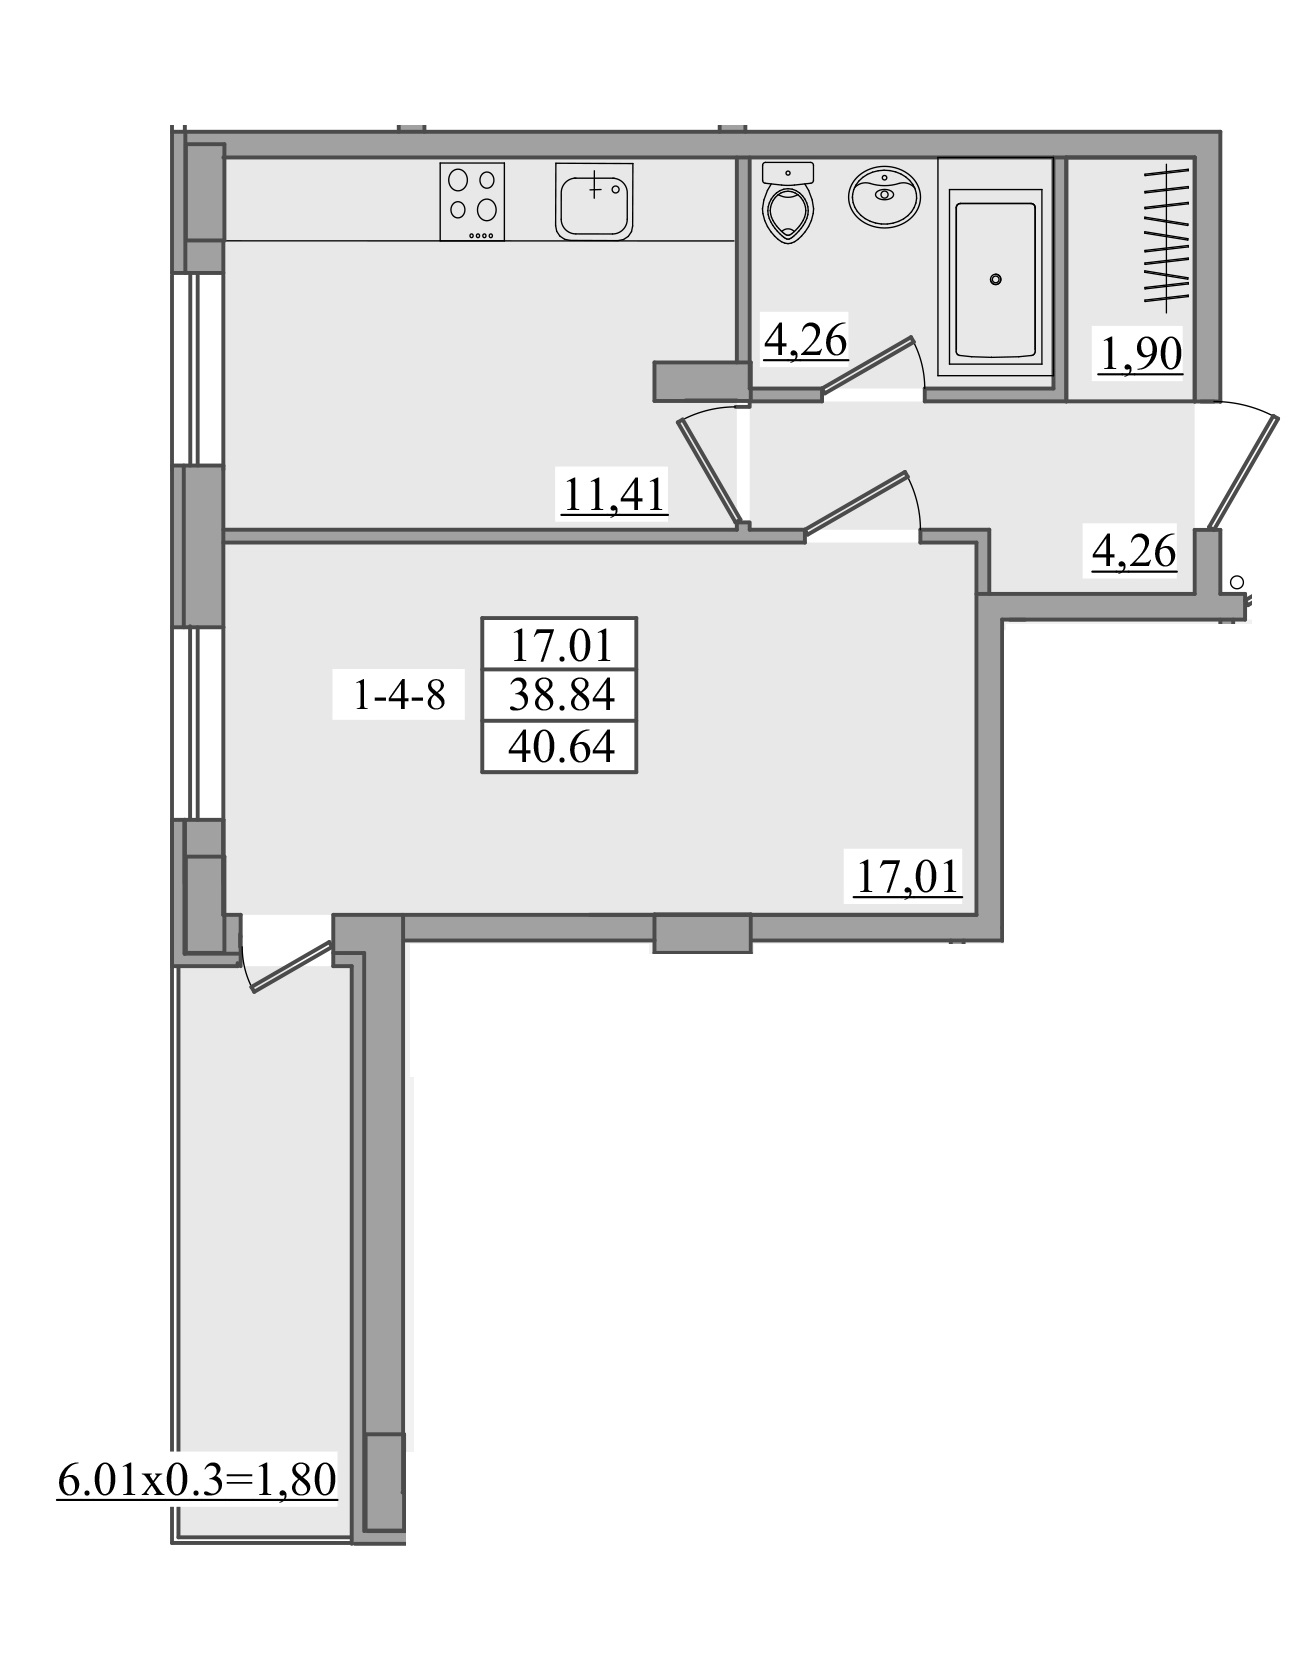 Однокомнатная - ЖК Платинум Резиденс Platinum Residence$39827Площадь:40,64m²